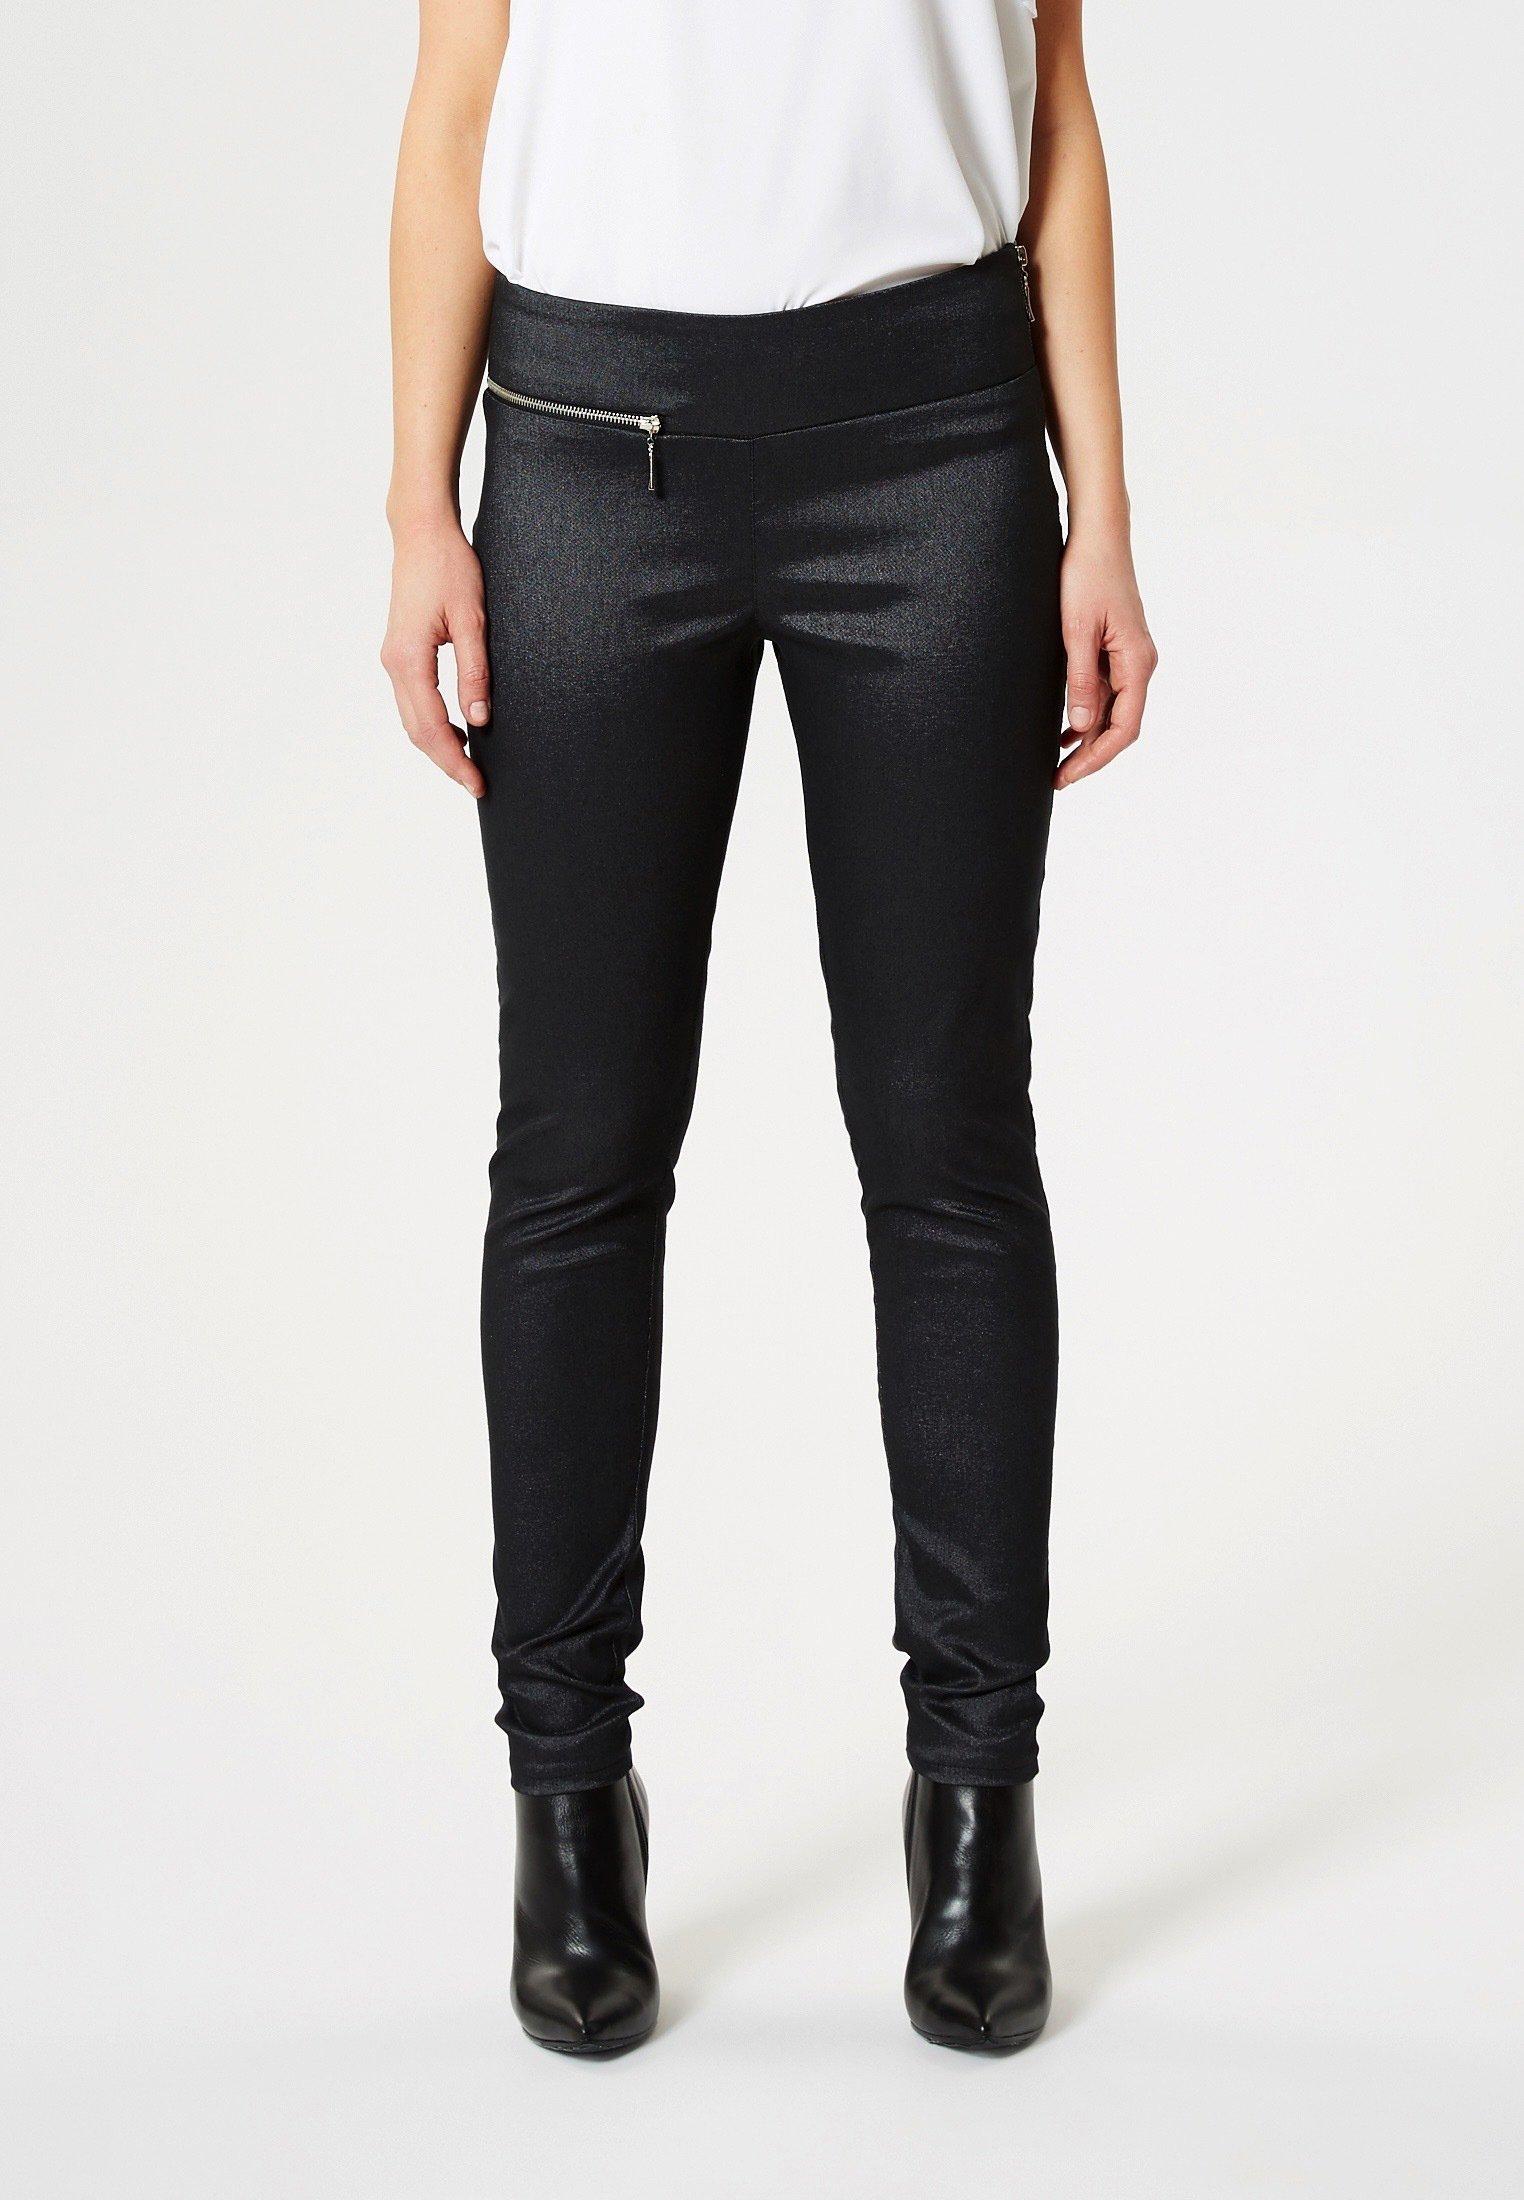 Largest Supplier Women's Clothing faina Leggings Trousers black 31kWbcACs